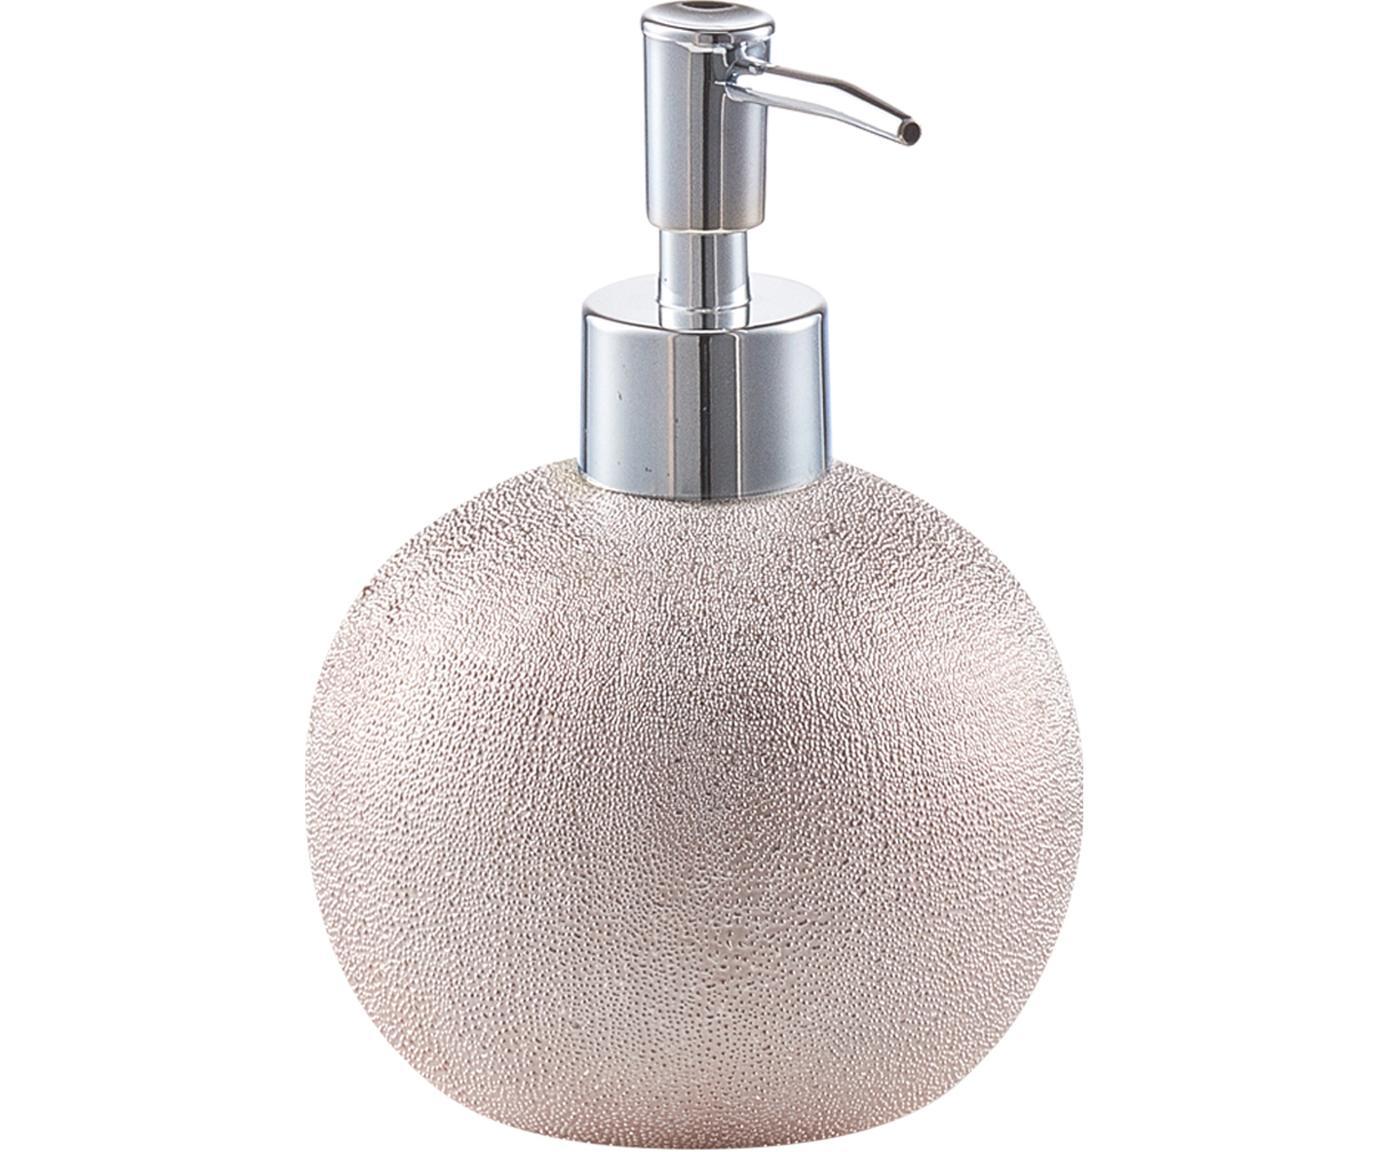 Zeepdispenser Glitter van keramiek, Houder: keramiek, Pompje: metaal, Roze goudkleurig, Ø 10 x H 15 cm